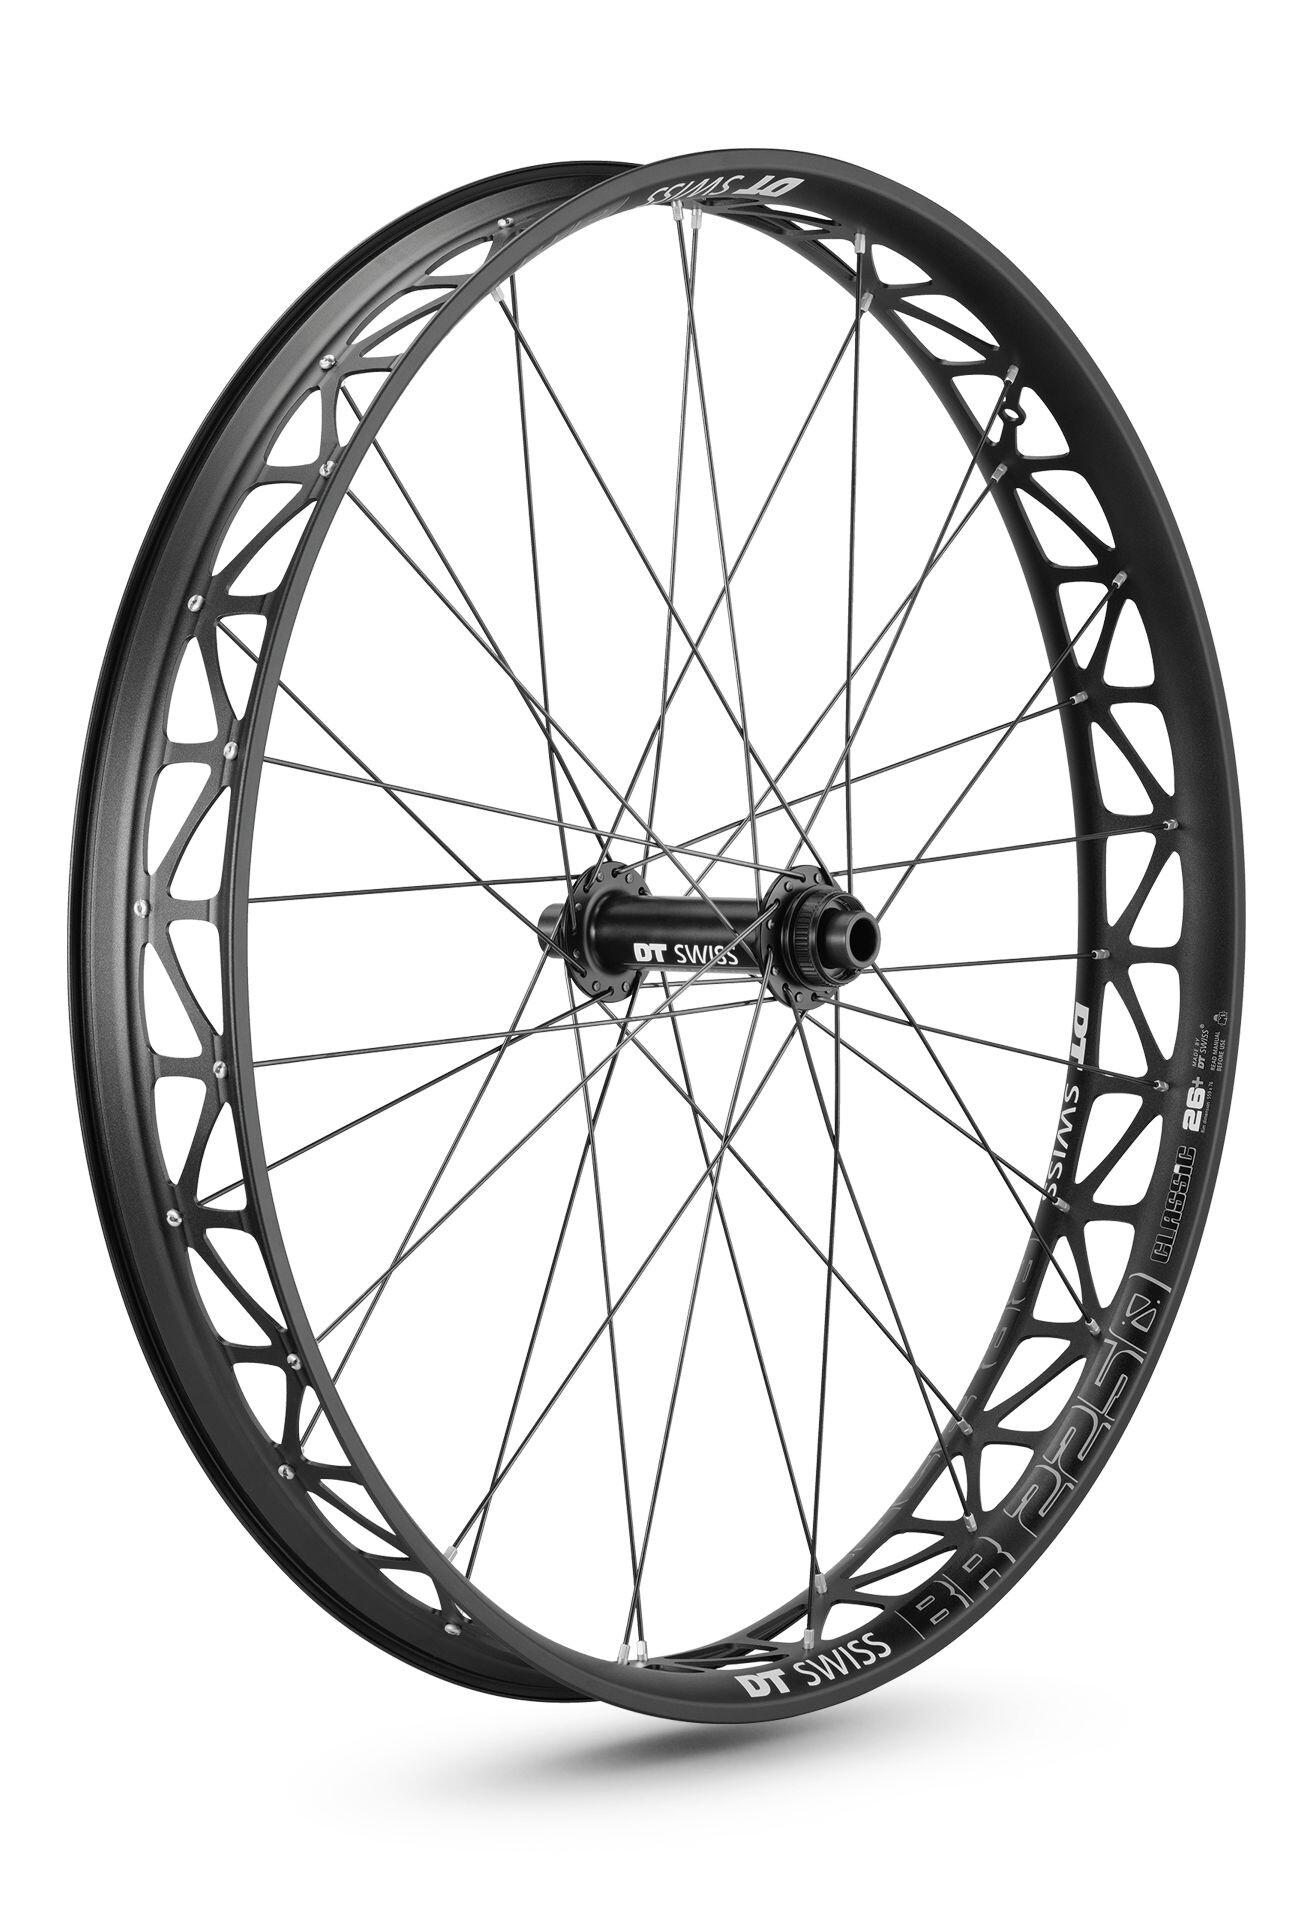 DT Swiss BR 2250 Classic Fatbike Wheel 26